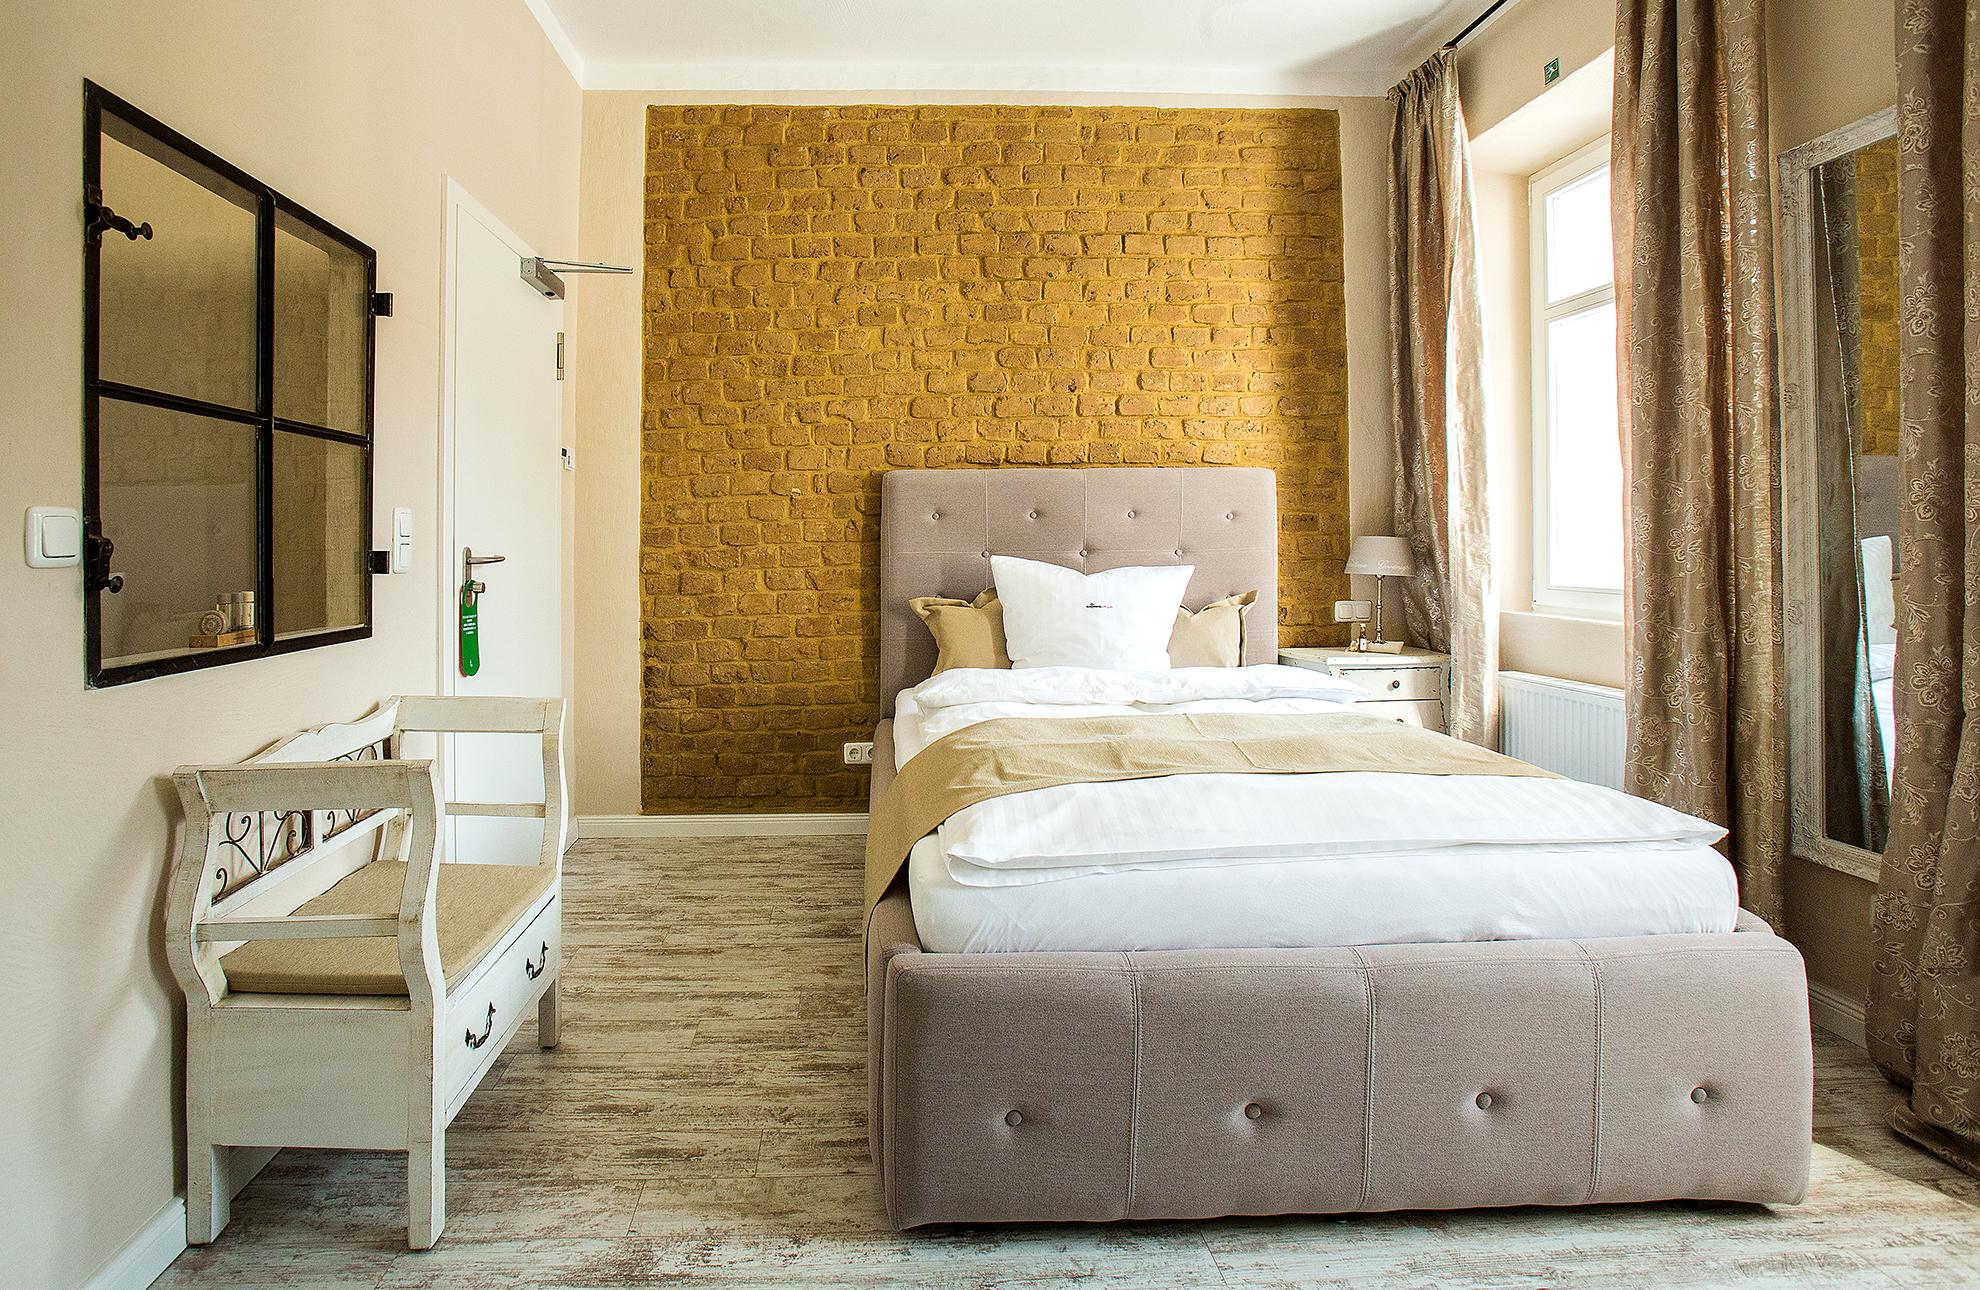 zwei1000_klosterhotel_neuzelle_interior_kepler